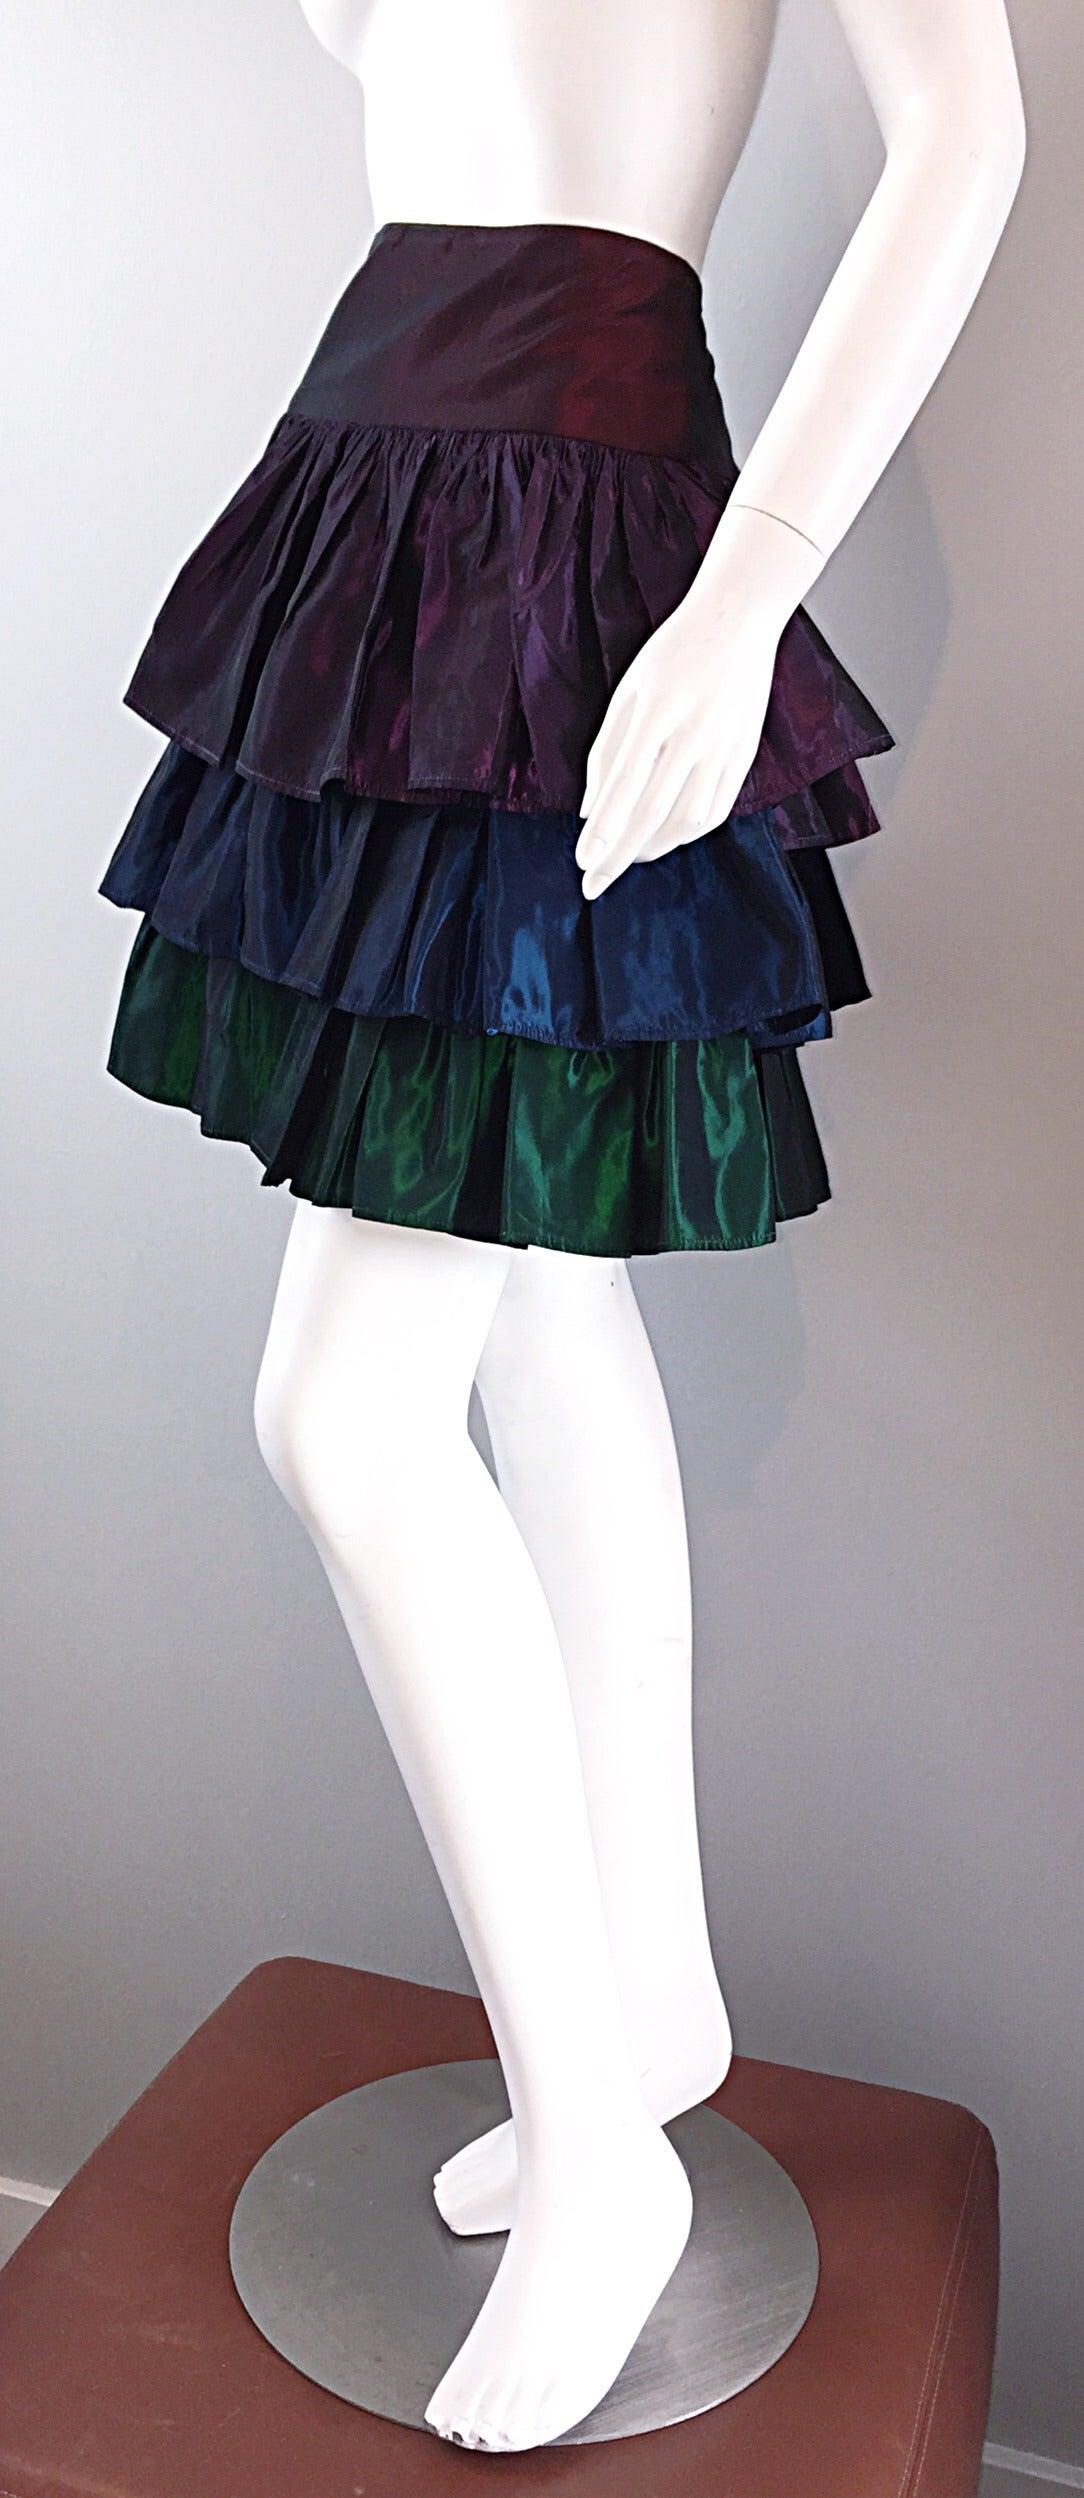 Kalinka For Bergdorf Goodman Tiered Taffeta ' Rainbow ' Vintage Skirt 7